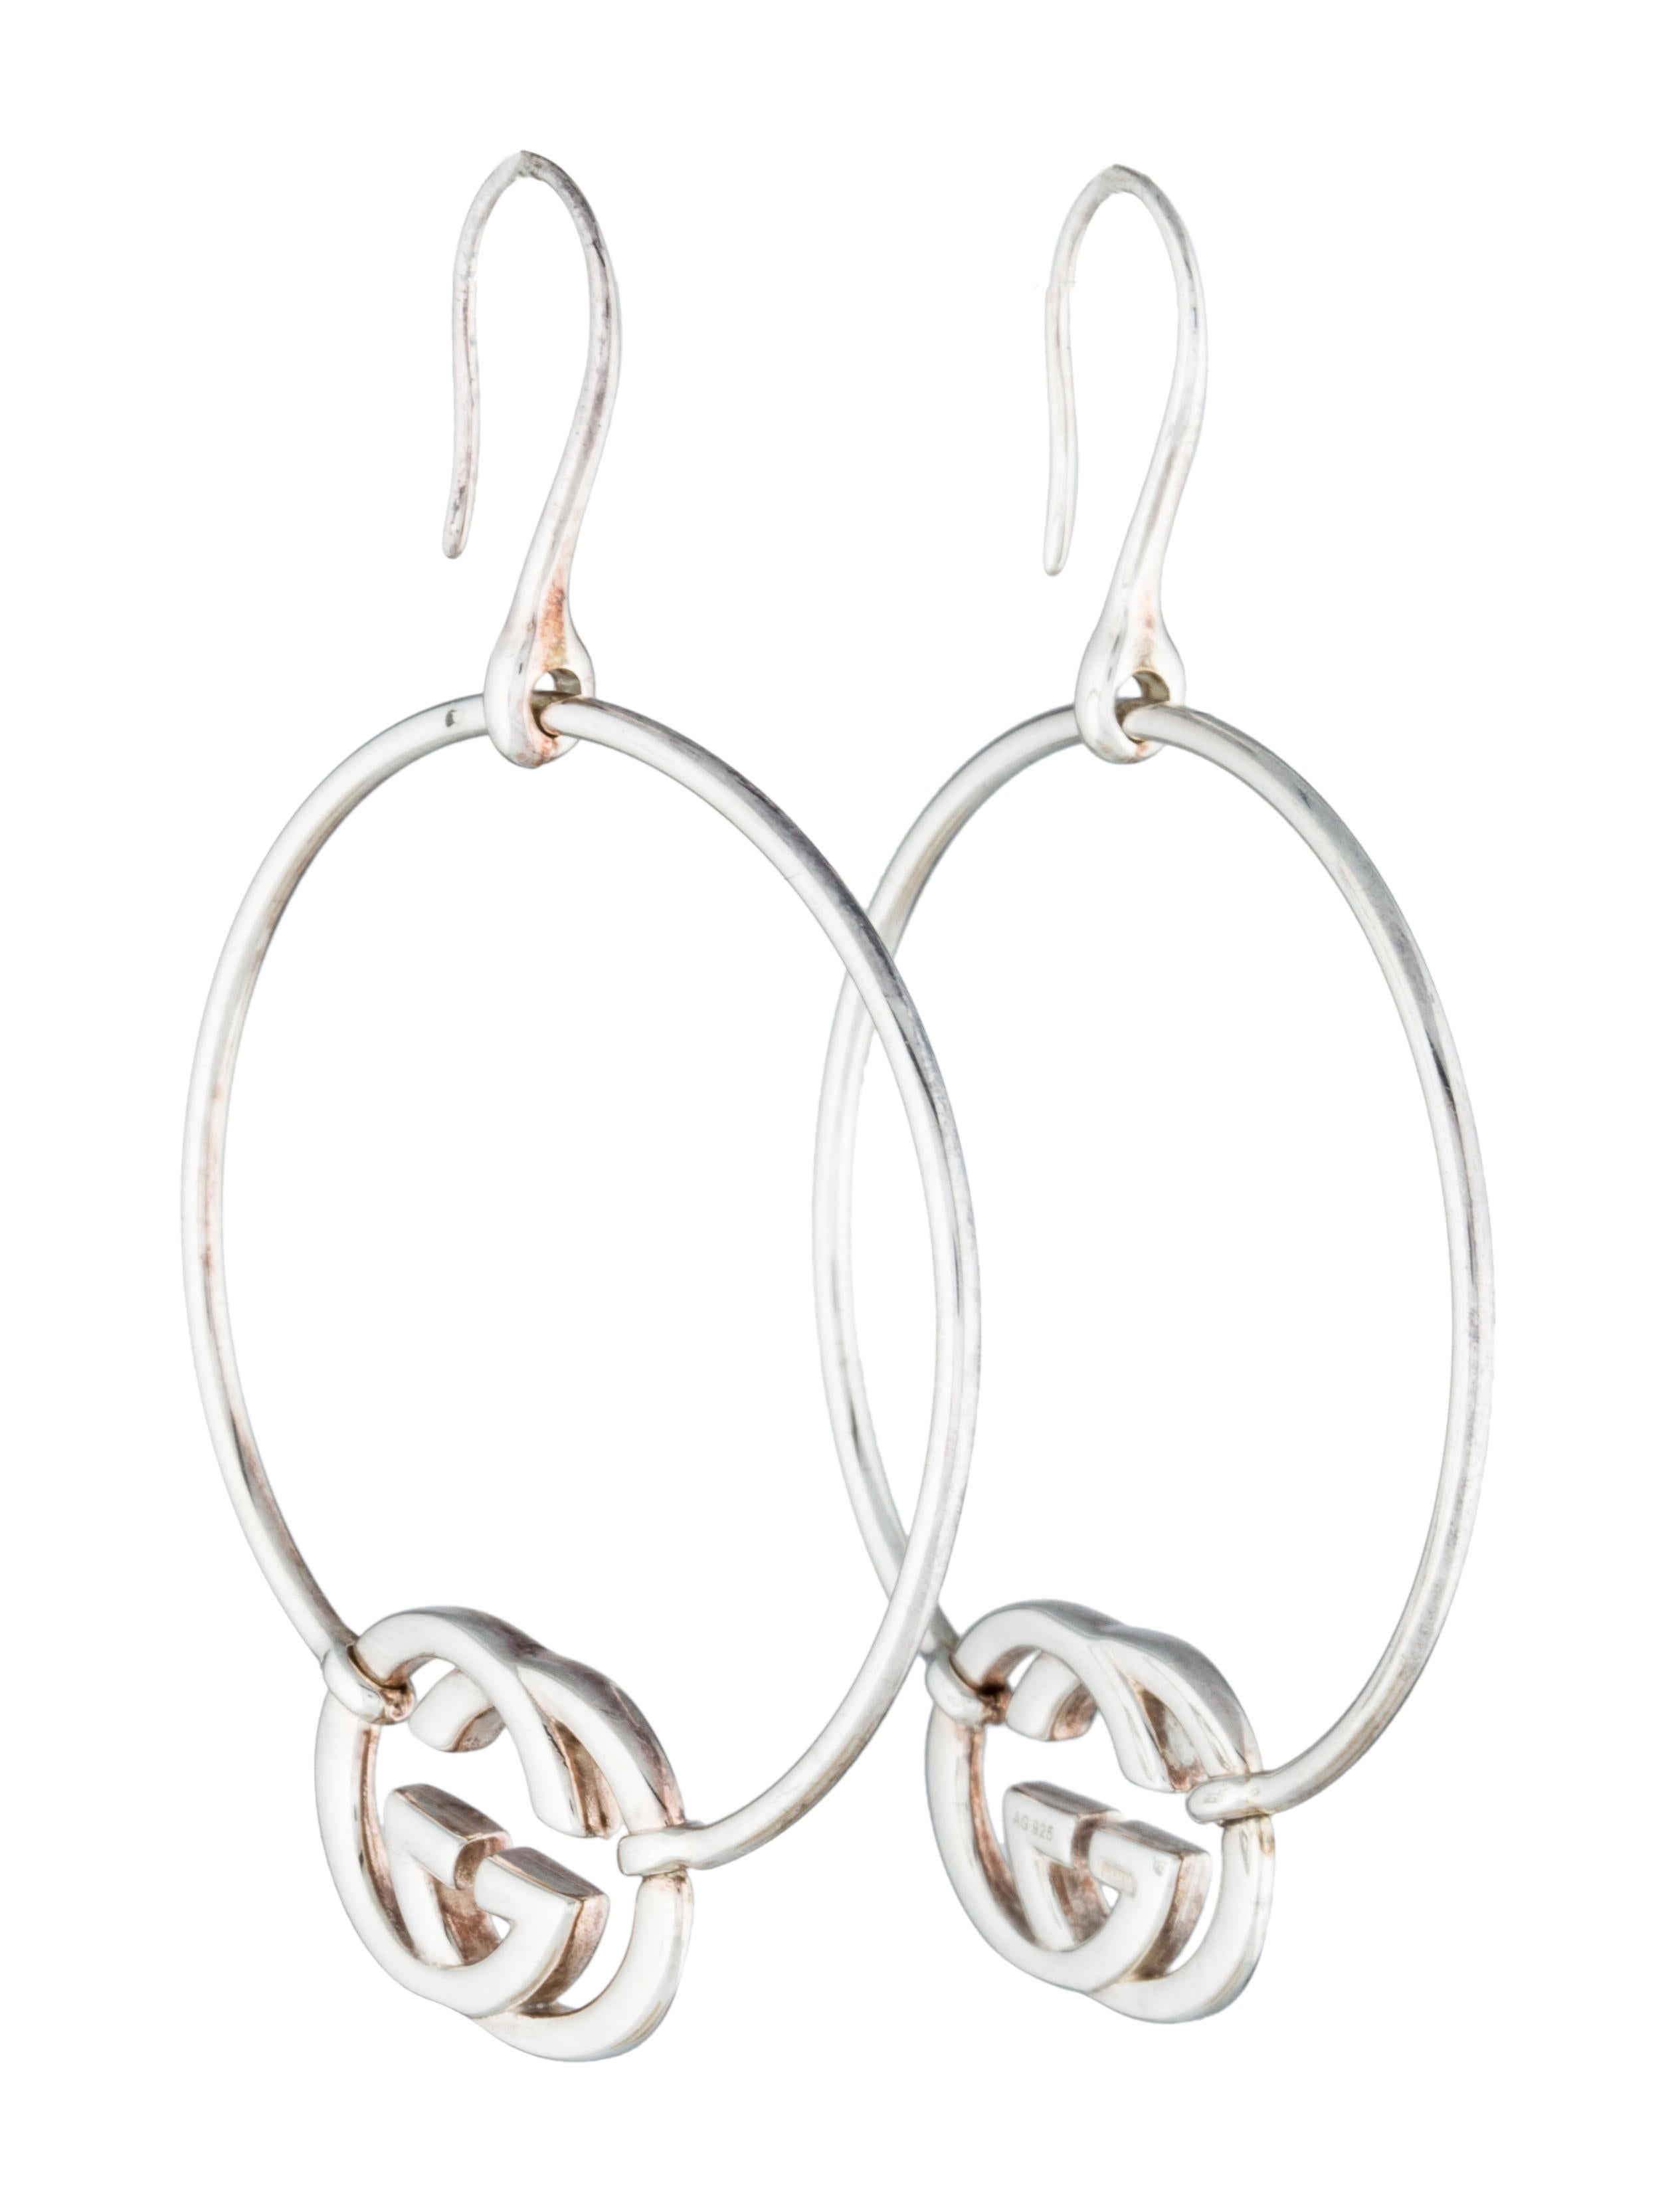 603fb0a20e7 Gucci Britt GG Hoop Earrings - Earrings - GUC52061